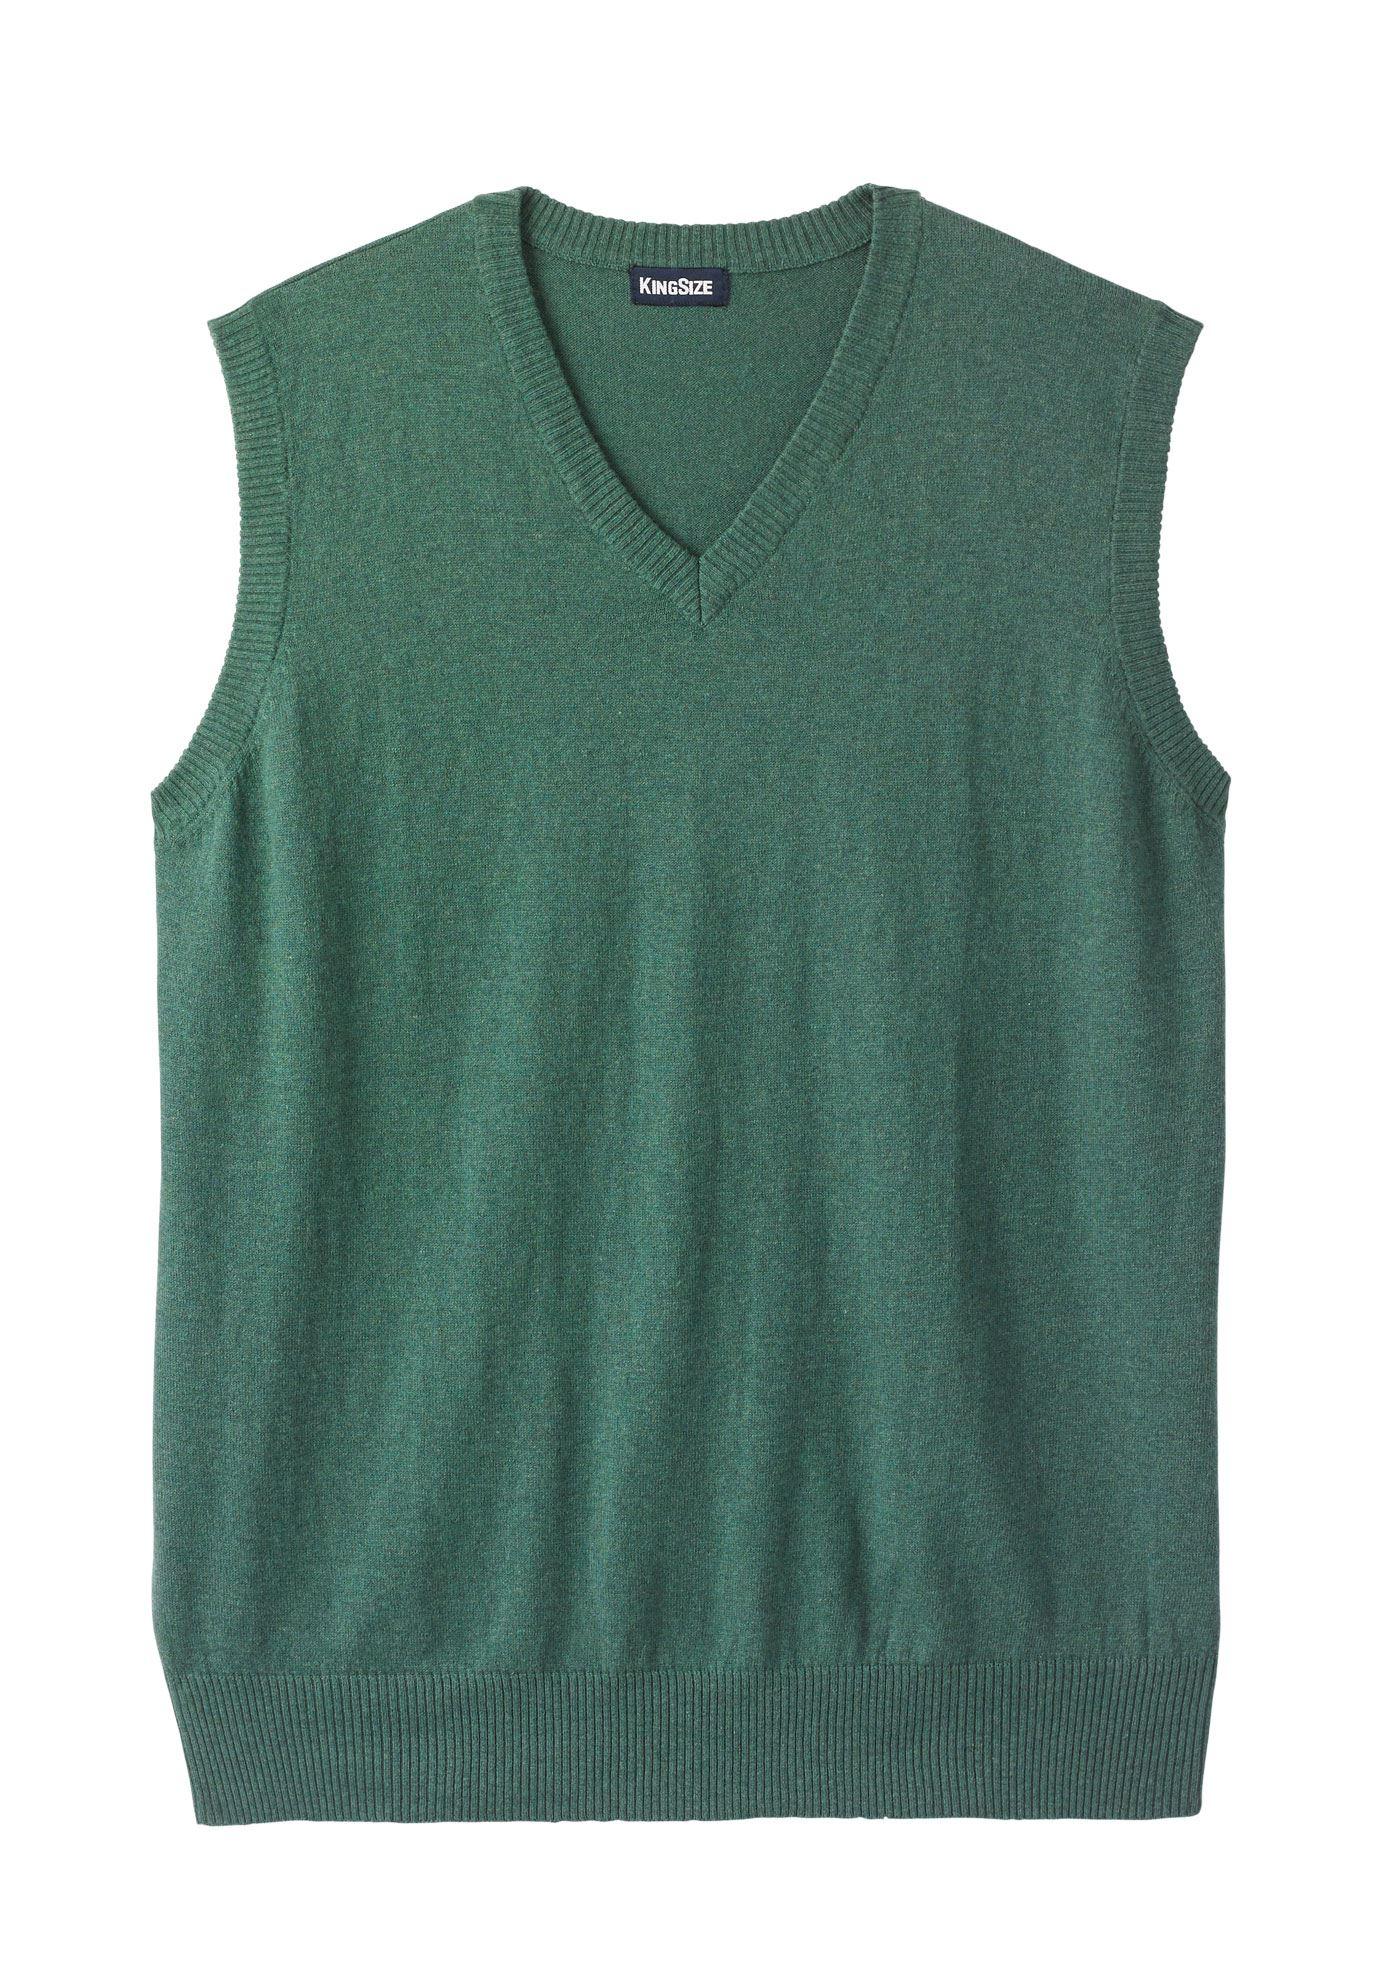 Men's Big & Tall Lightweight V-neck Sweater Vest